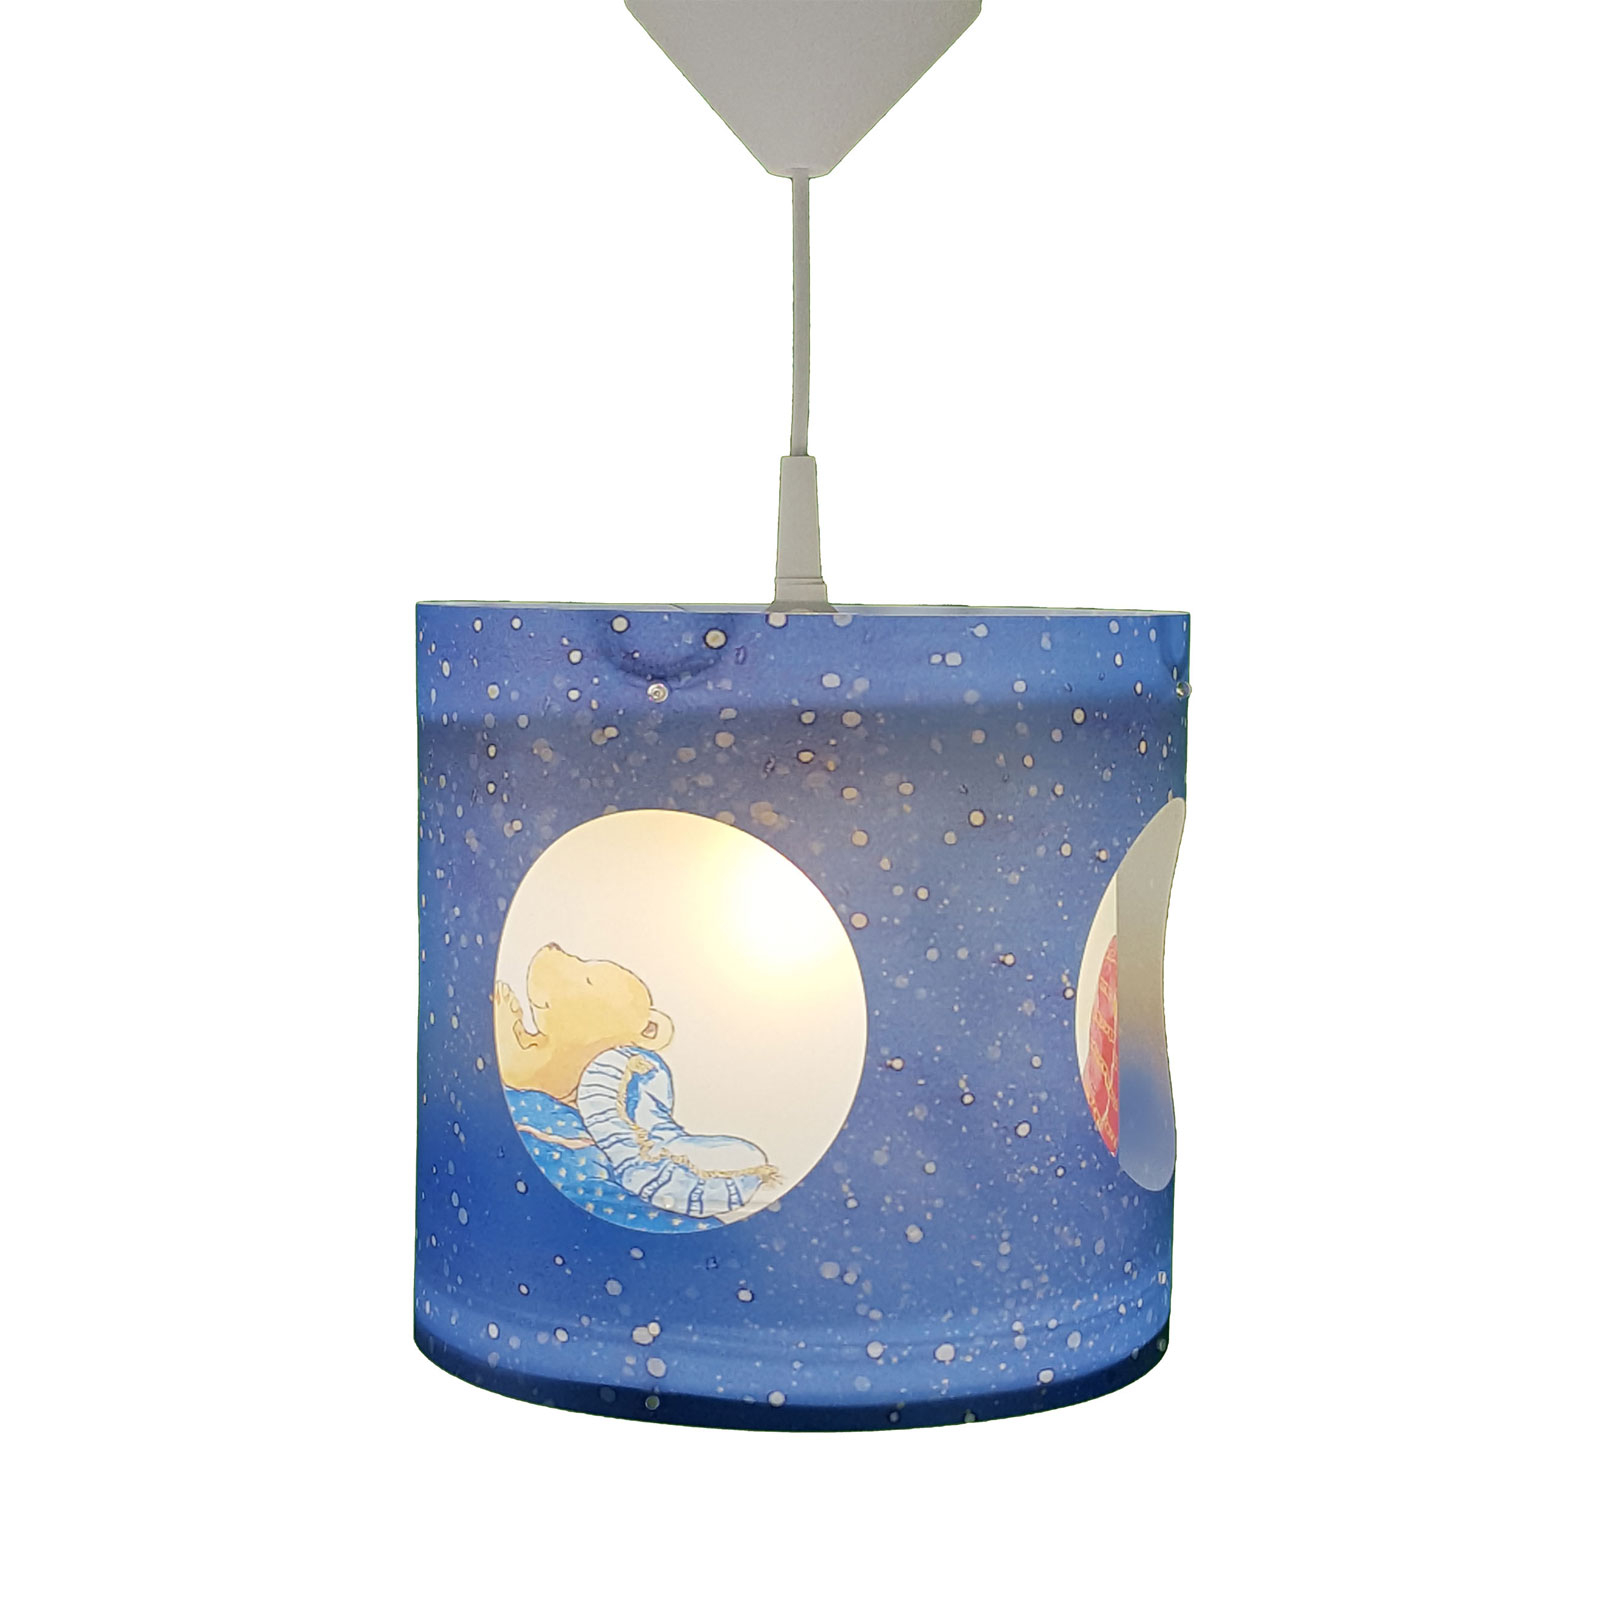 Draai-hanglamp Bärchen, blauw